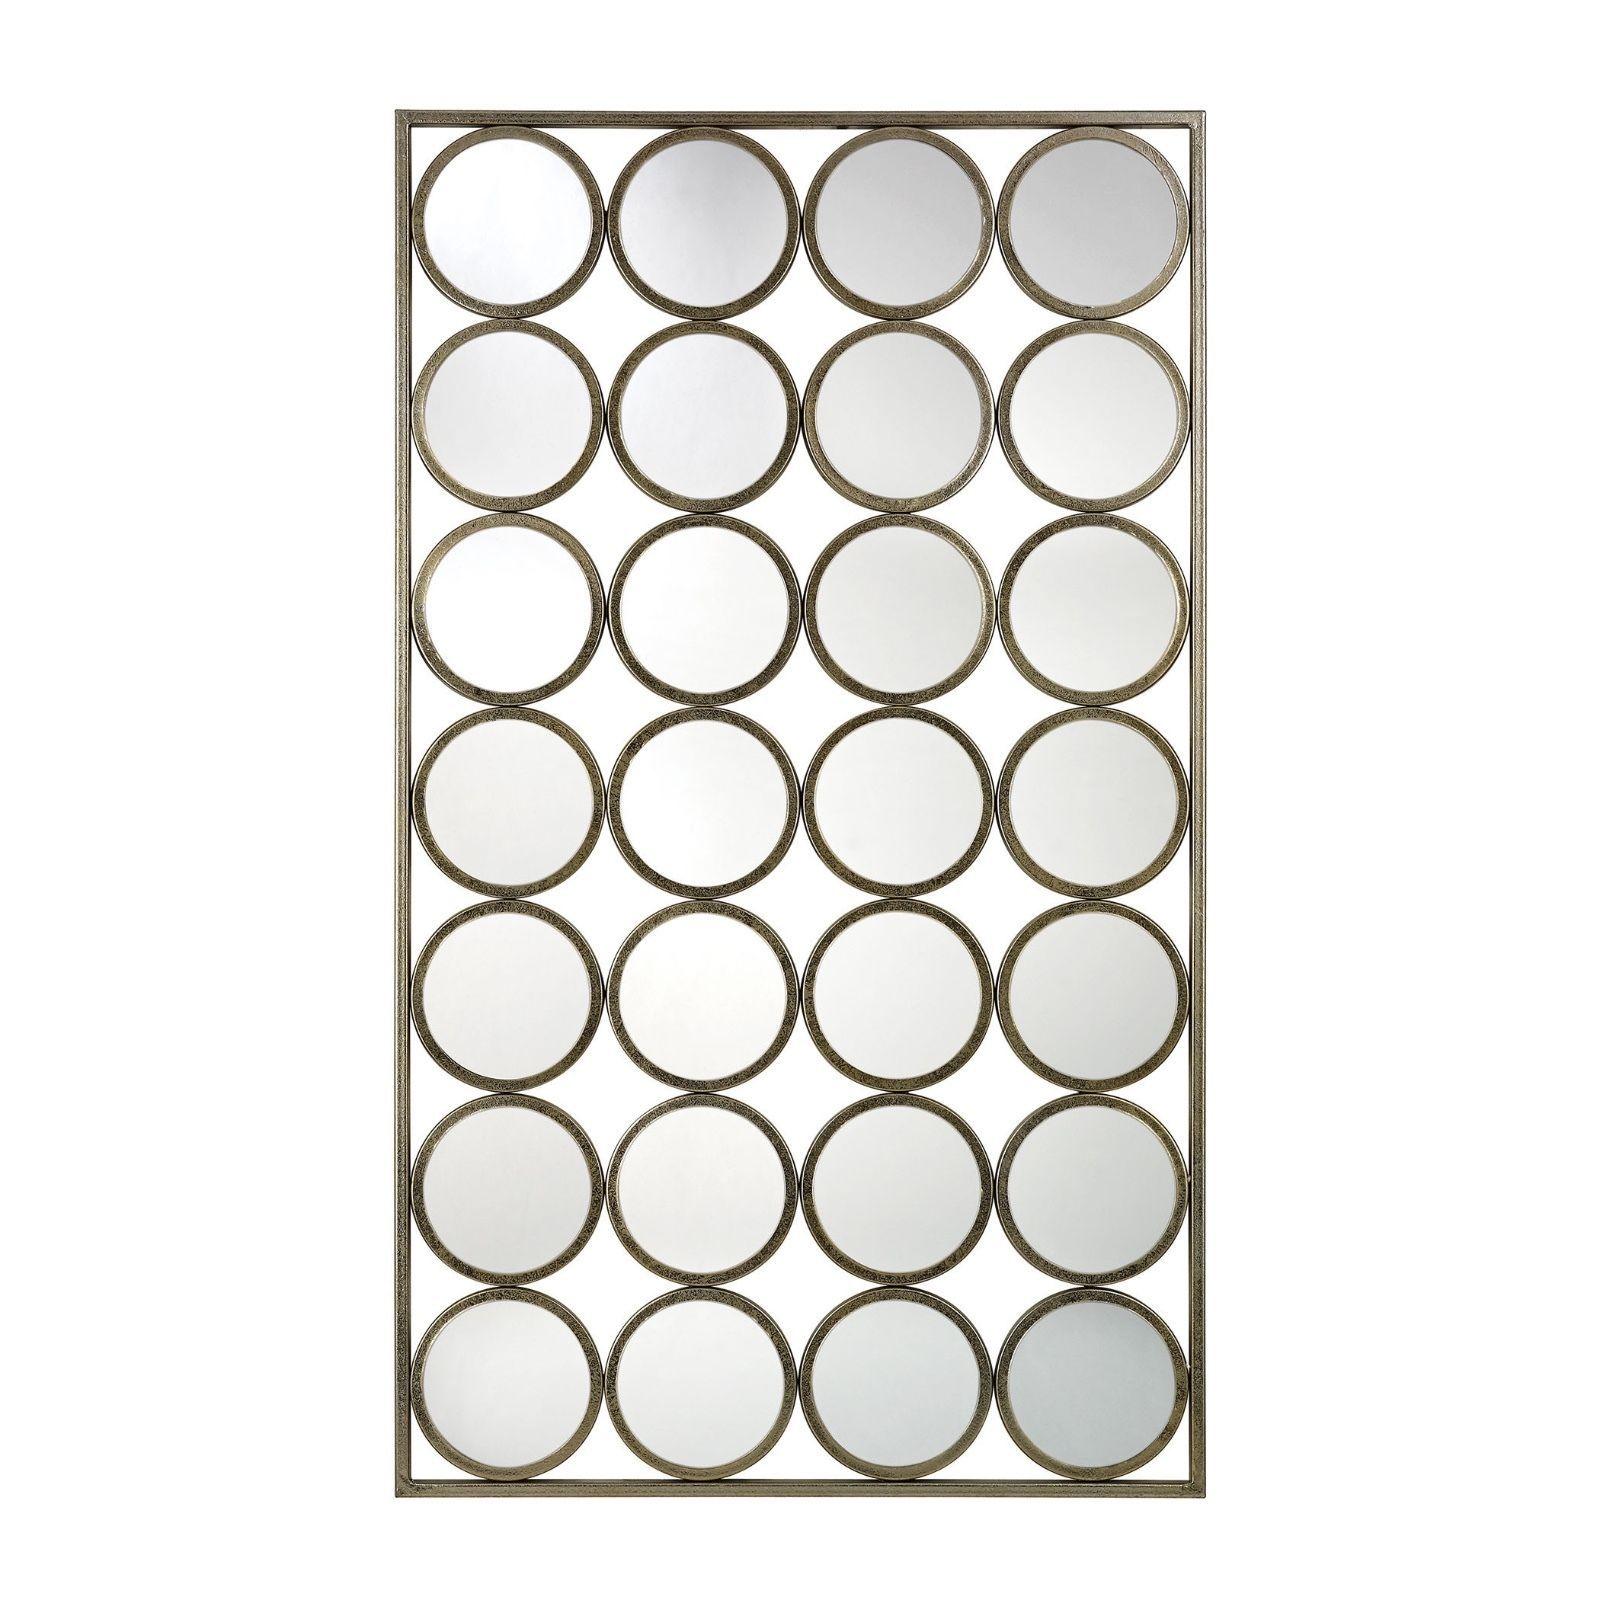 Mid Century Modern Retro Circles Circular Soft Gold Large Rectangle Wall Mirror